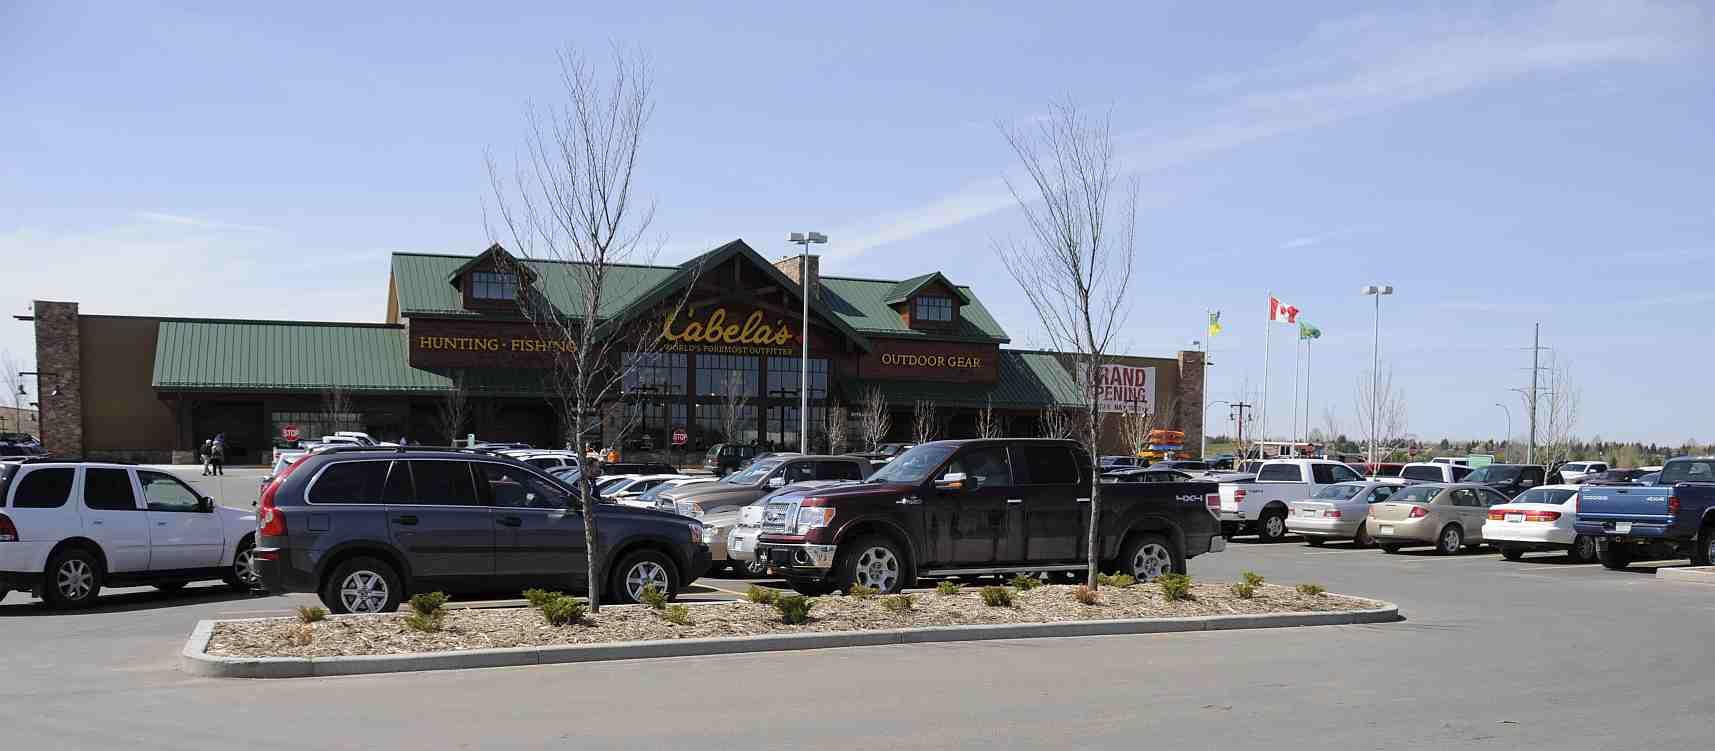 Another canadian store this week in saskatoon , saskatchewan, canada